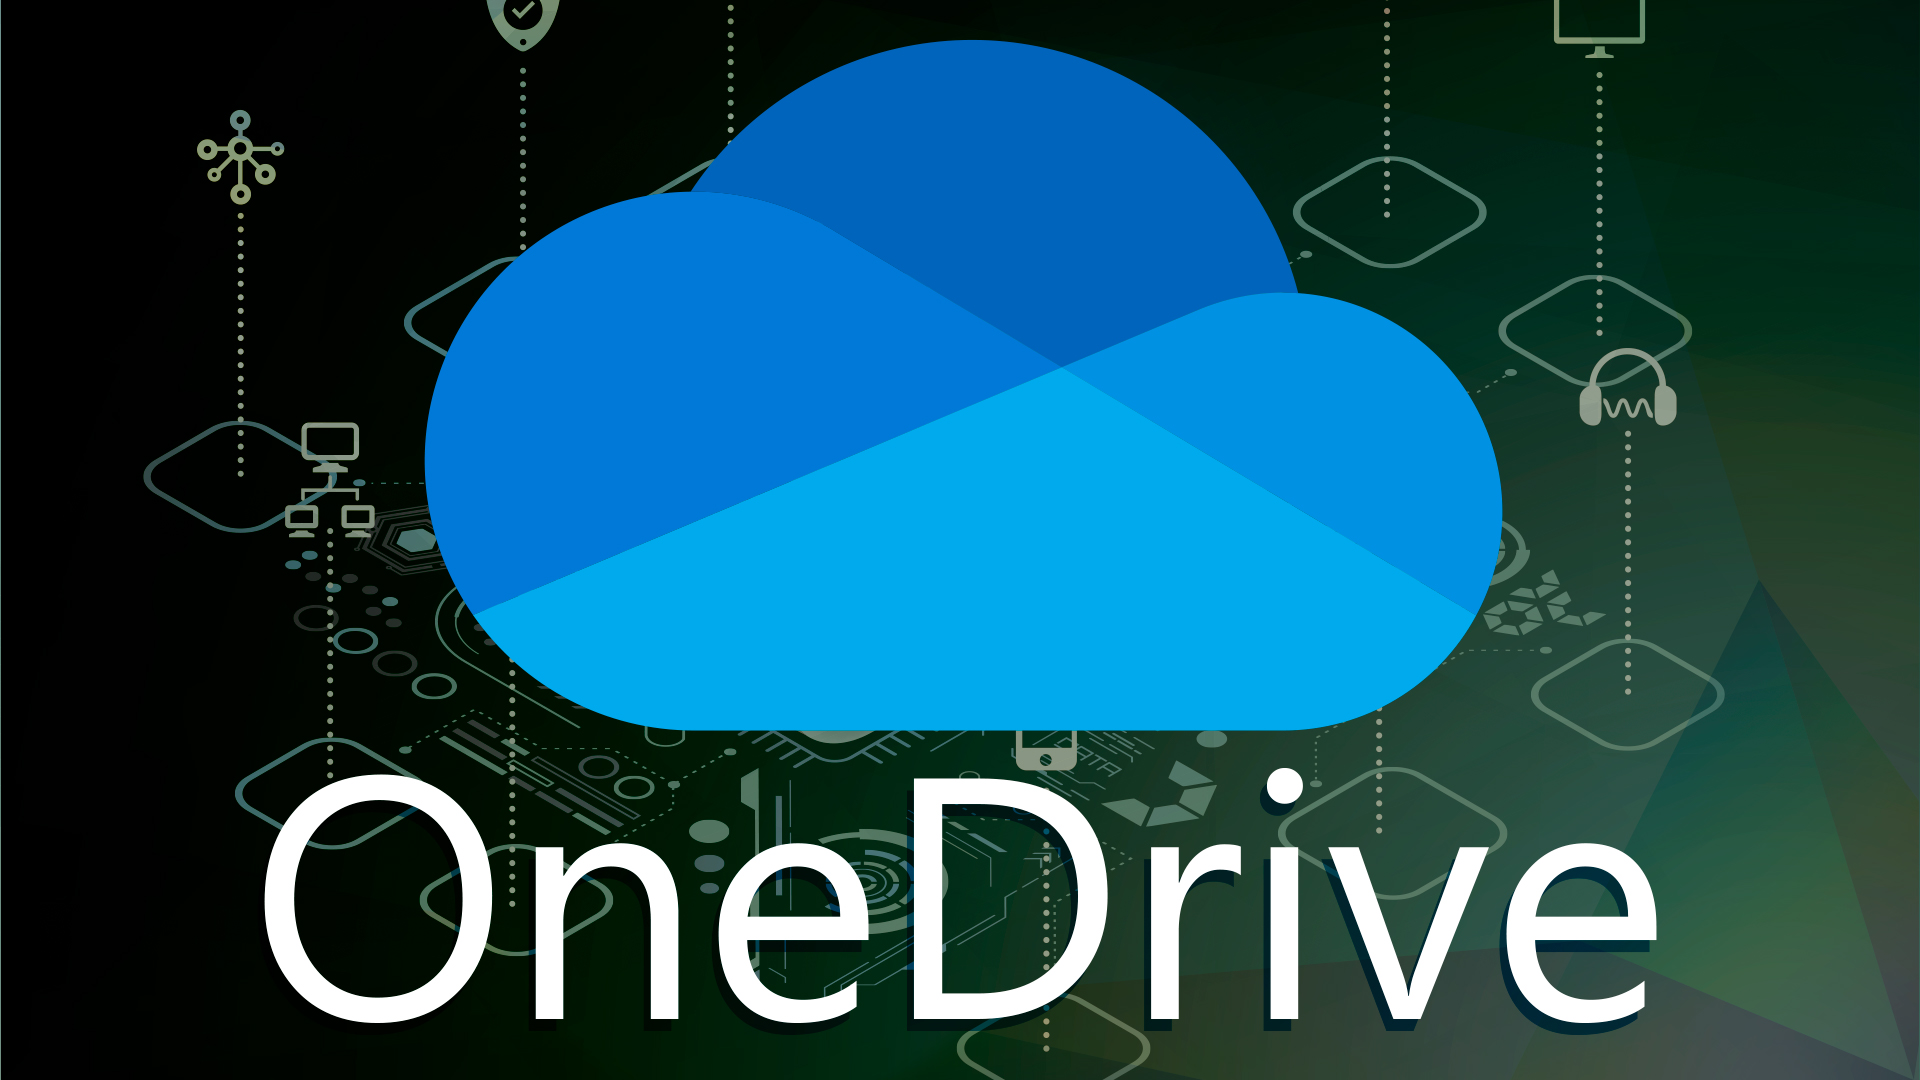 Download, OneDrive, icon, Microsoft OneDrive, Microsoft OneDrive Logo, OneDrive Logo, OneDrive for Business